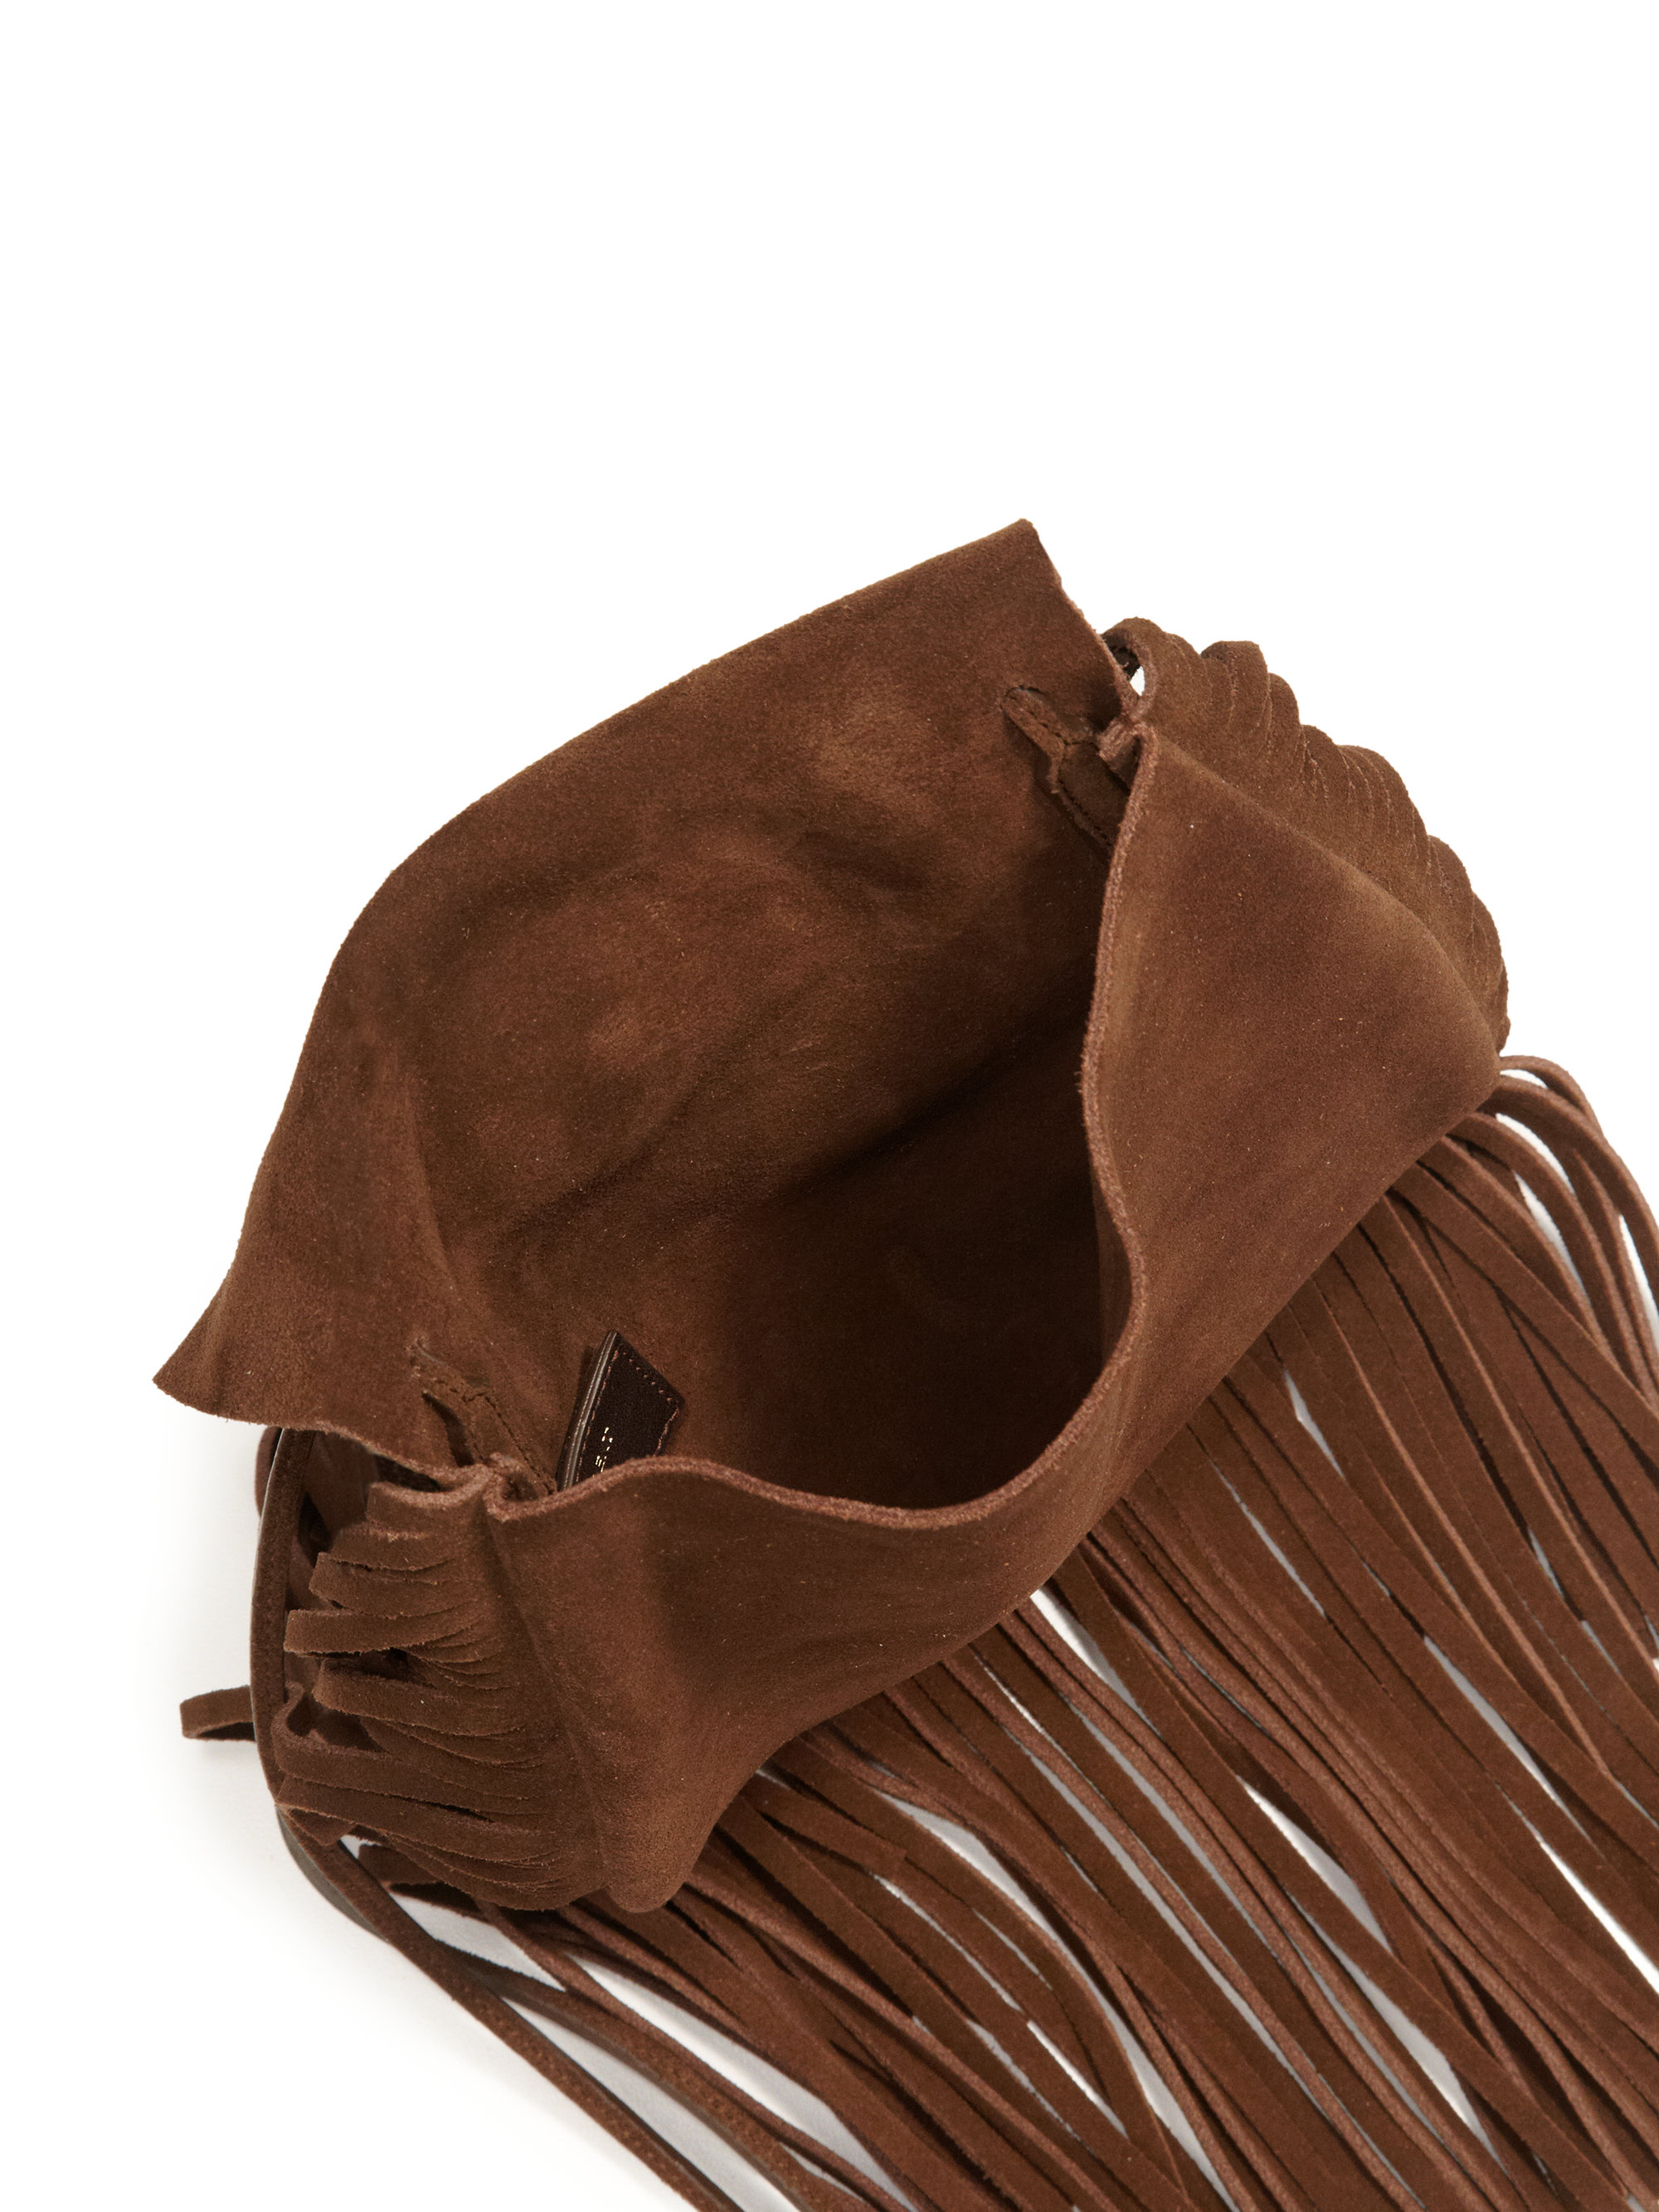 c220eb39f1 Lyst - Saint Laurent Anita Fringe Suede Crossbody Bag in Brown